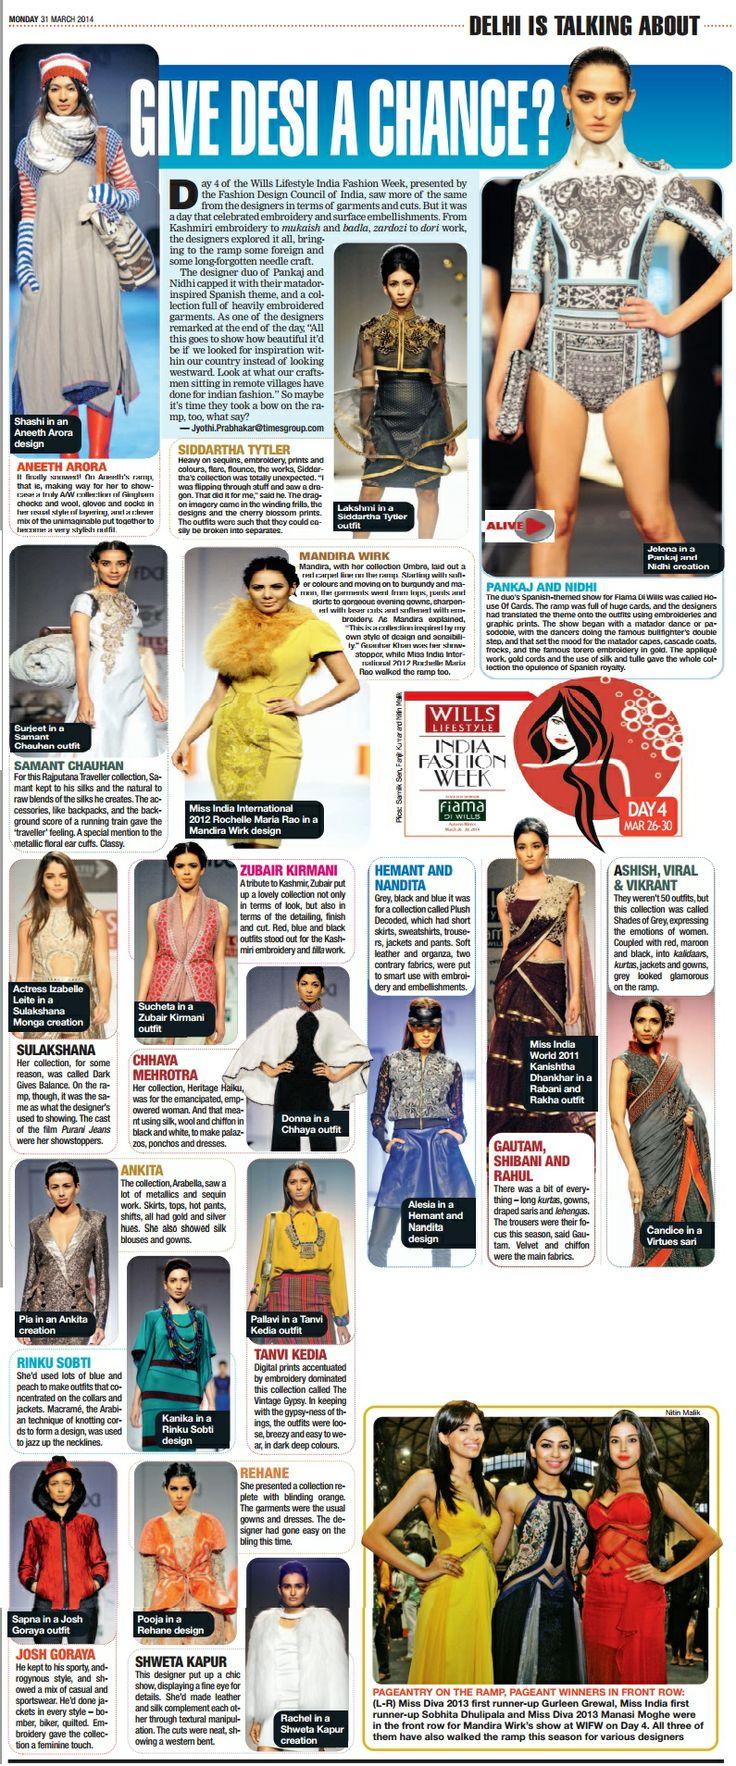 Designer Rinku Sobti_ Delhi Times Coverage_31st March'14